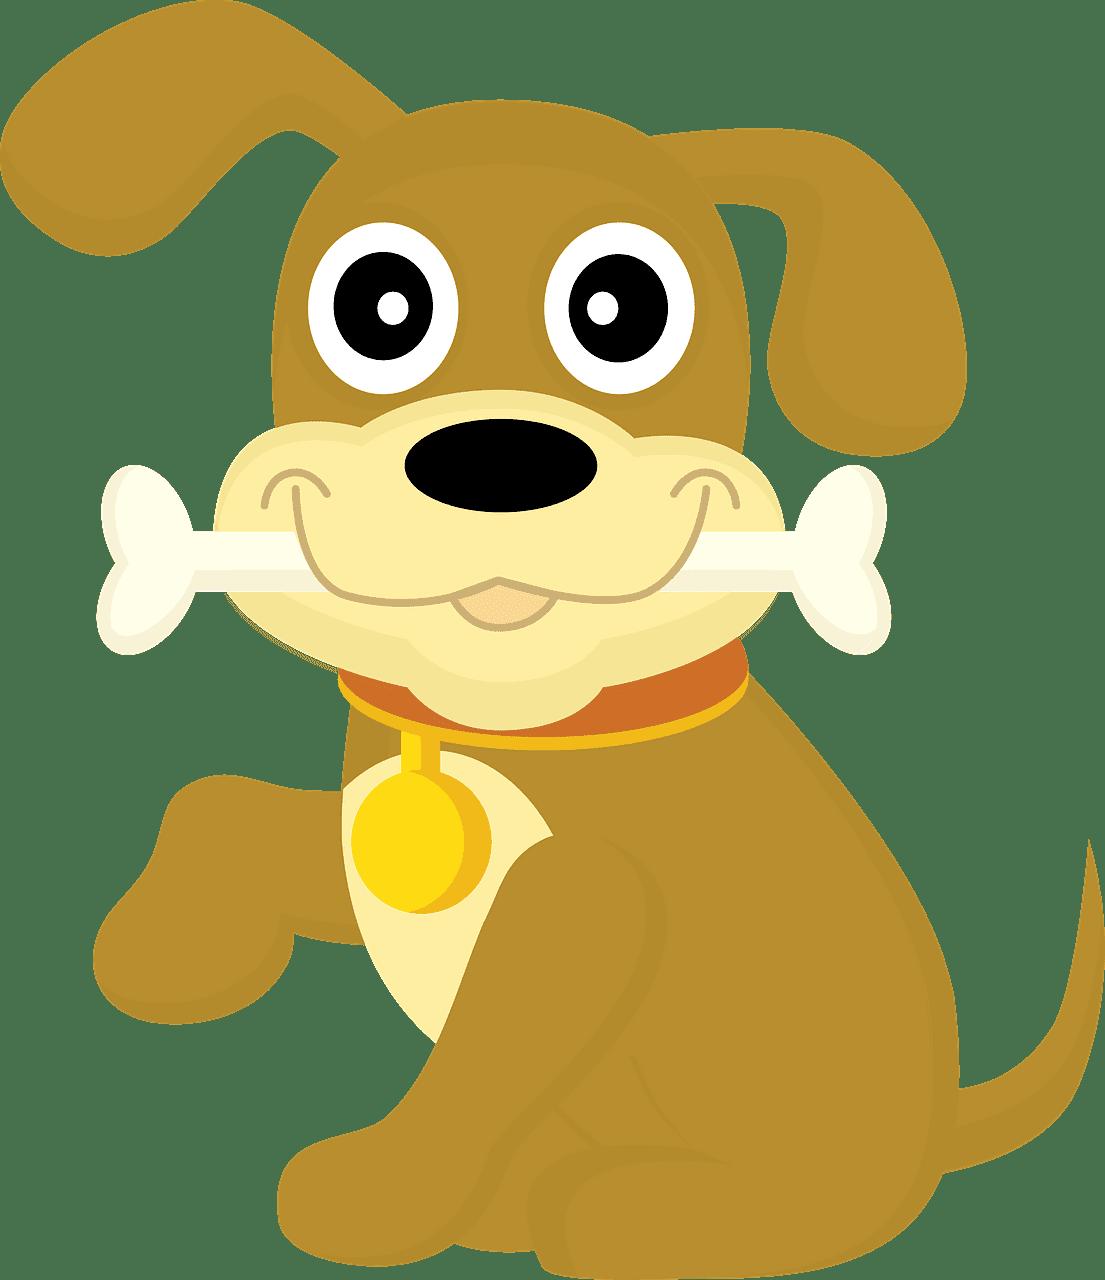 Puppy clipart transparent image